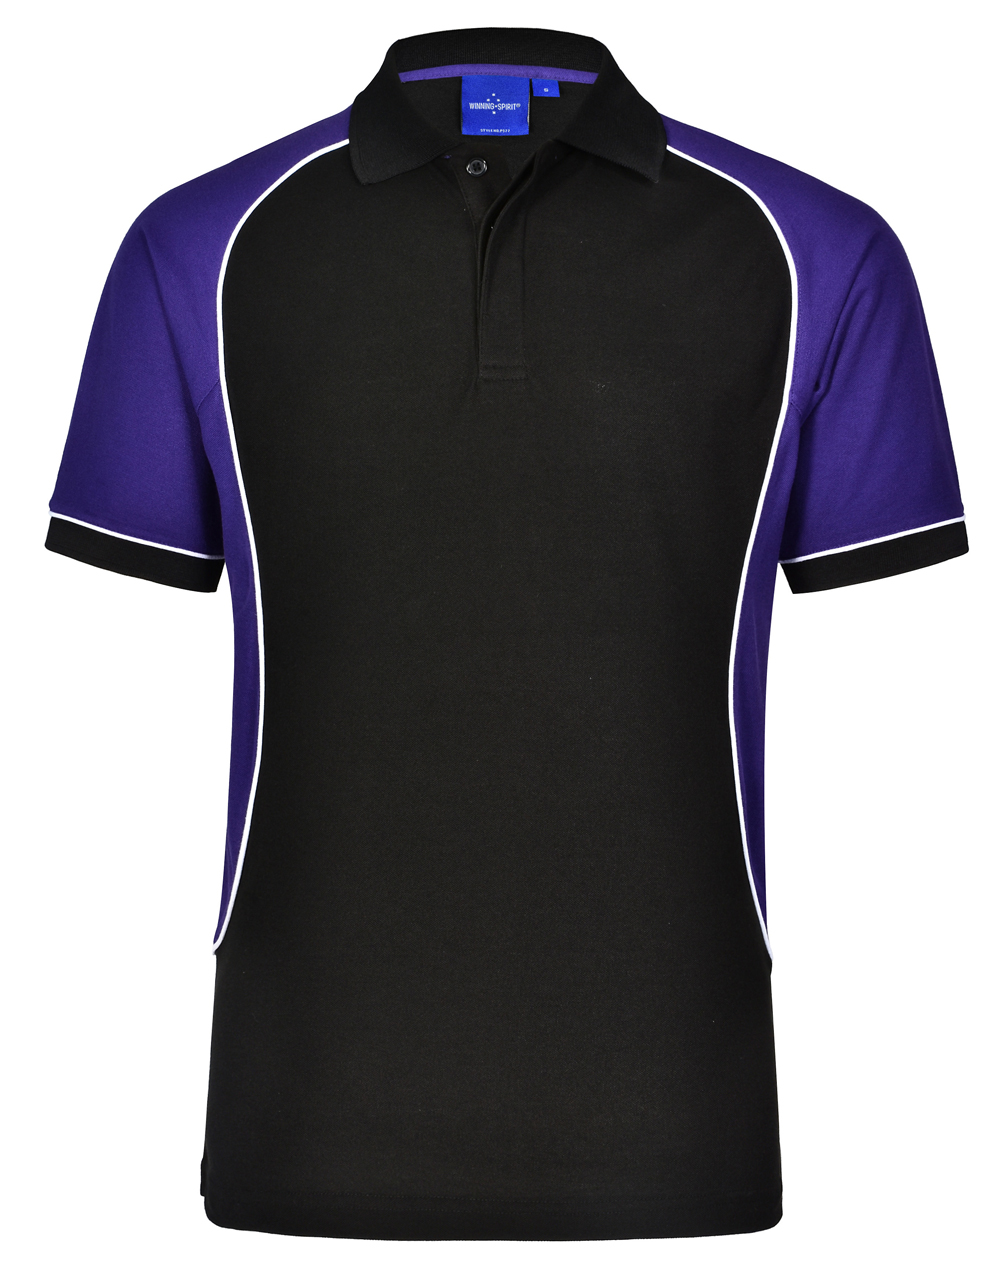 Black.White.Purple